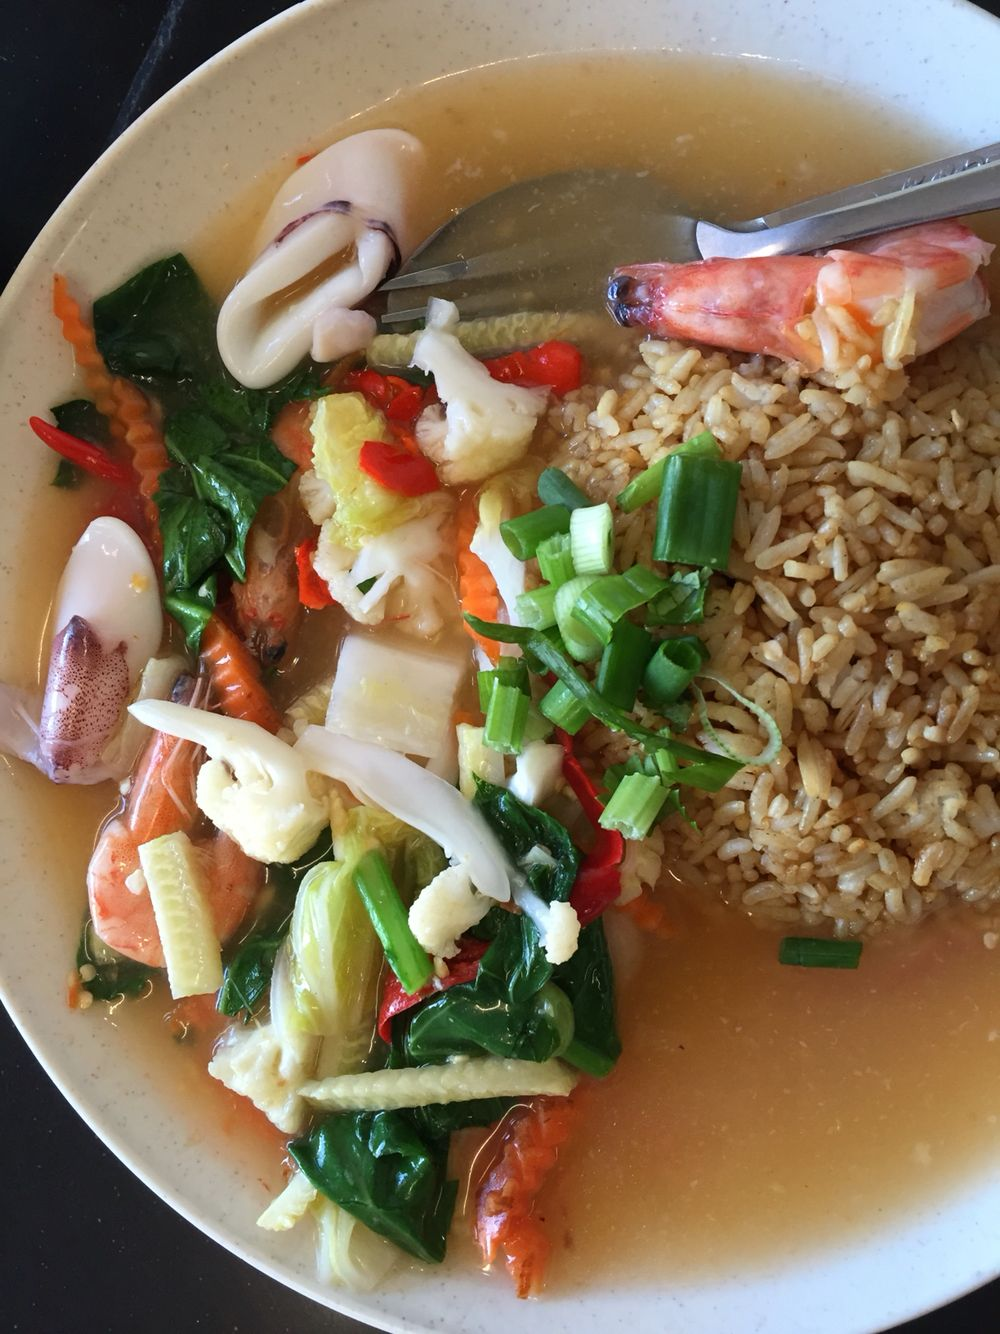 Nasi Goreng Ladna - Types of Nasi goreng you must try in Malaysia - Ummi Goes Where?